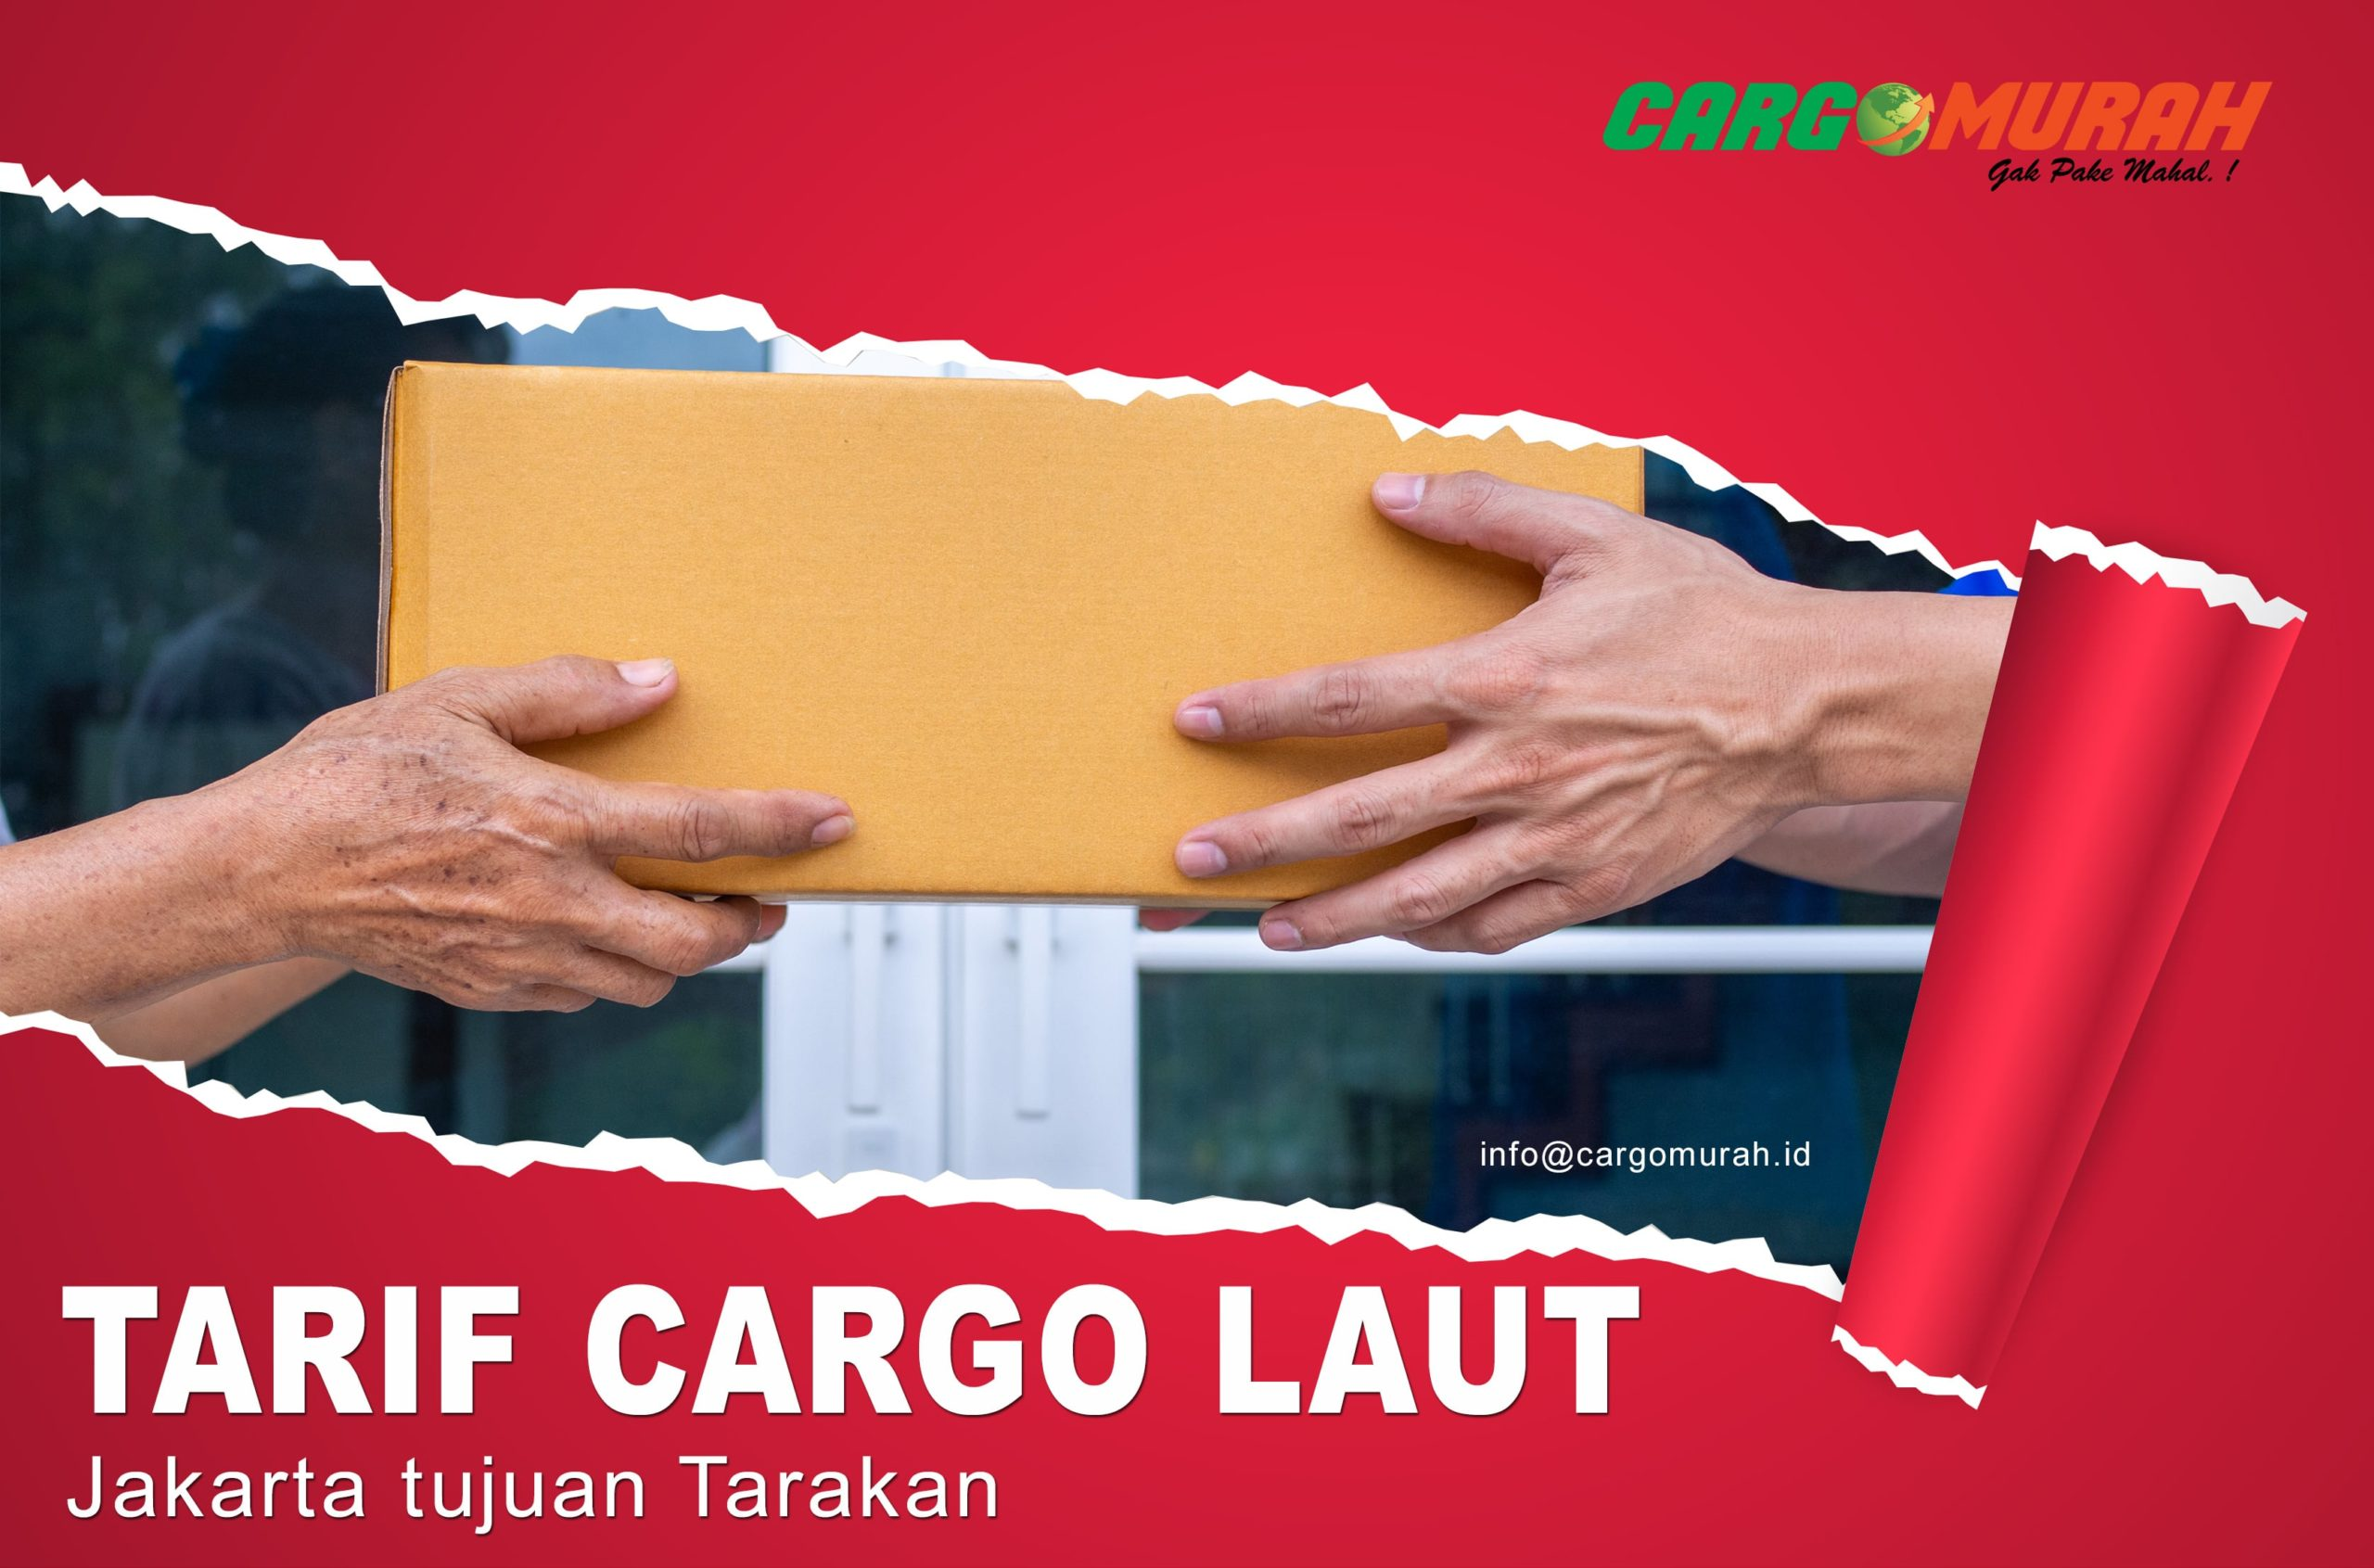 Cargo Jakarta ke Tarakan